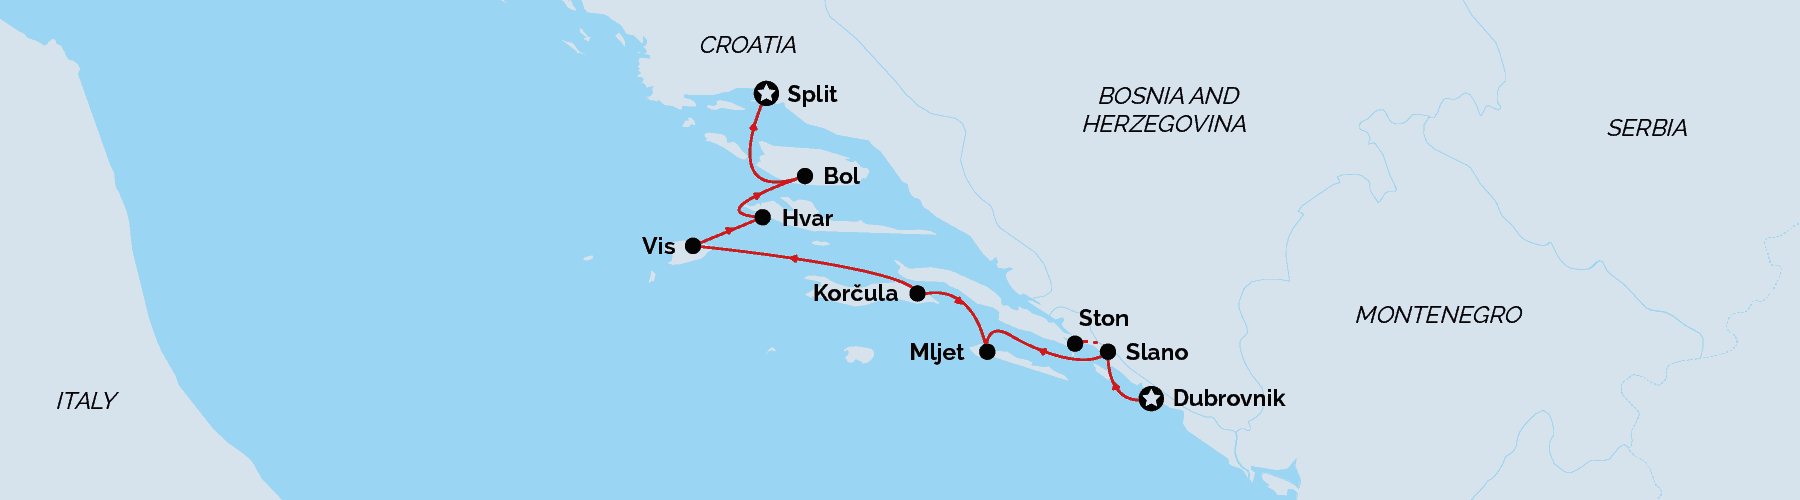 Cruise map - Dubrovnik to Split, Croatia